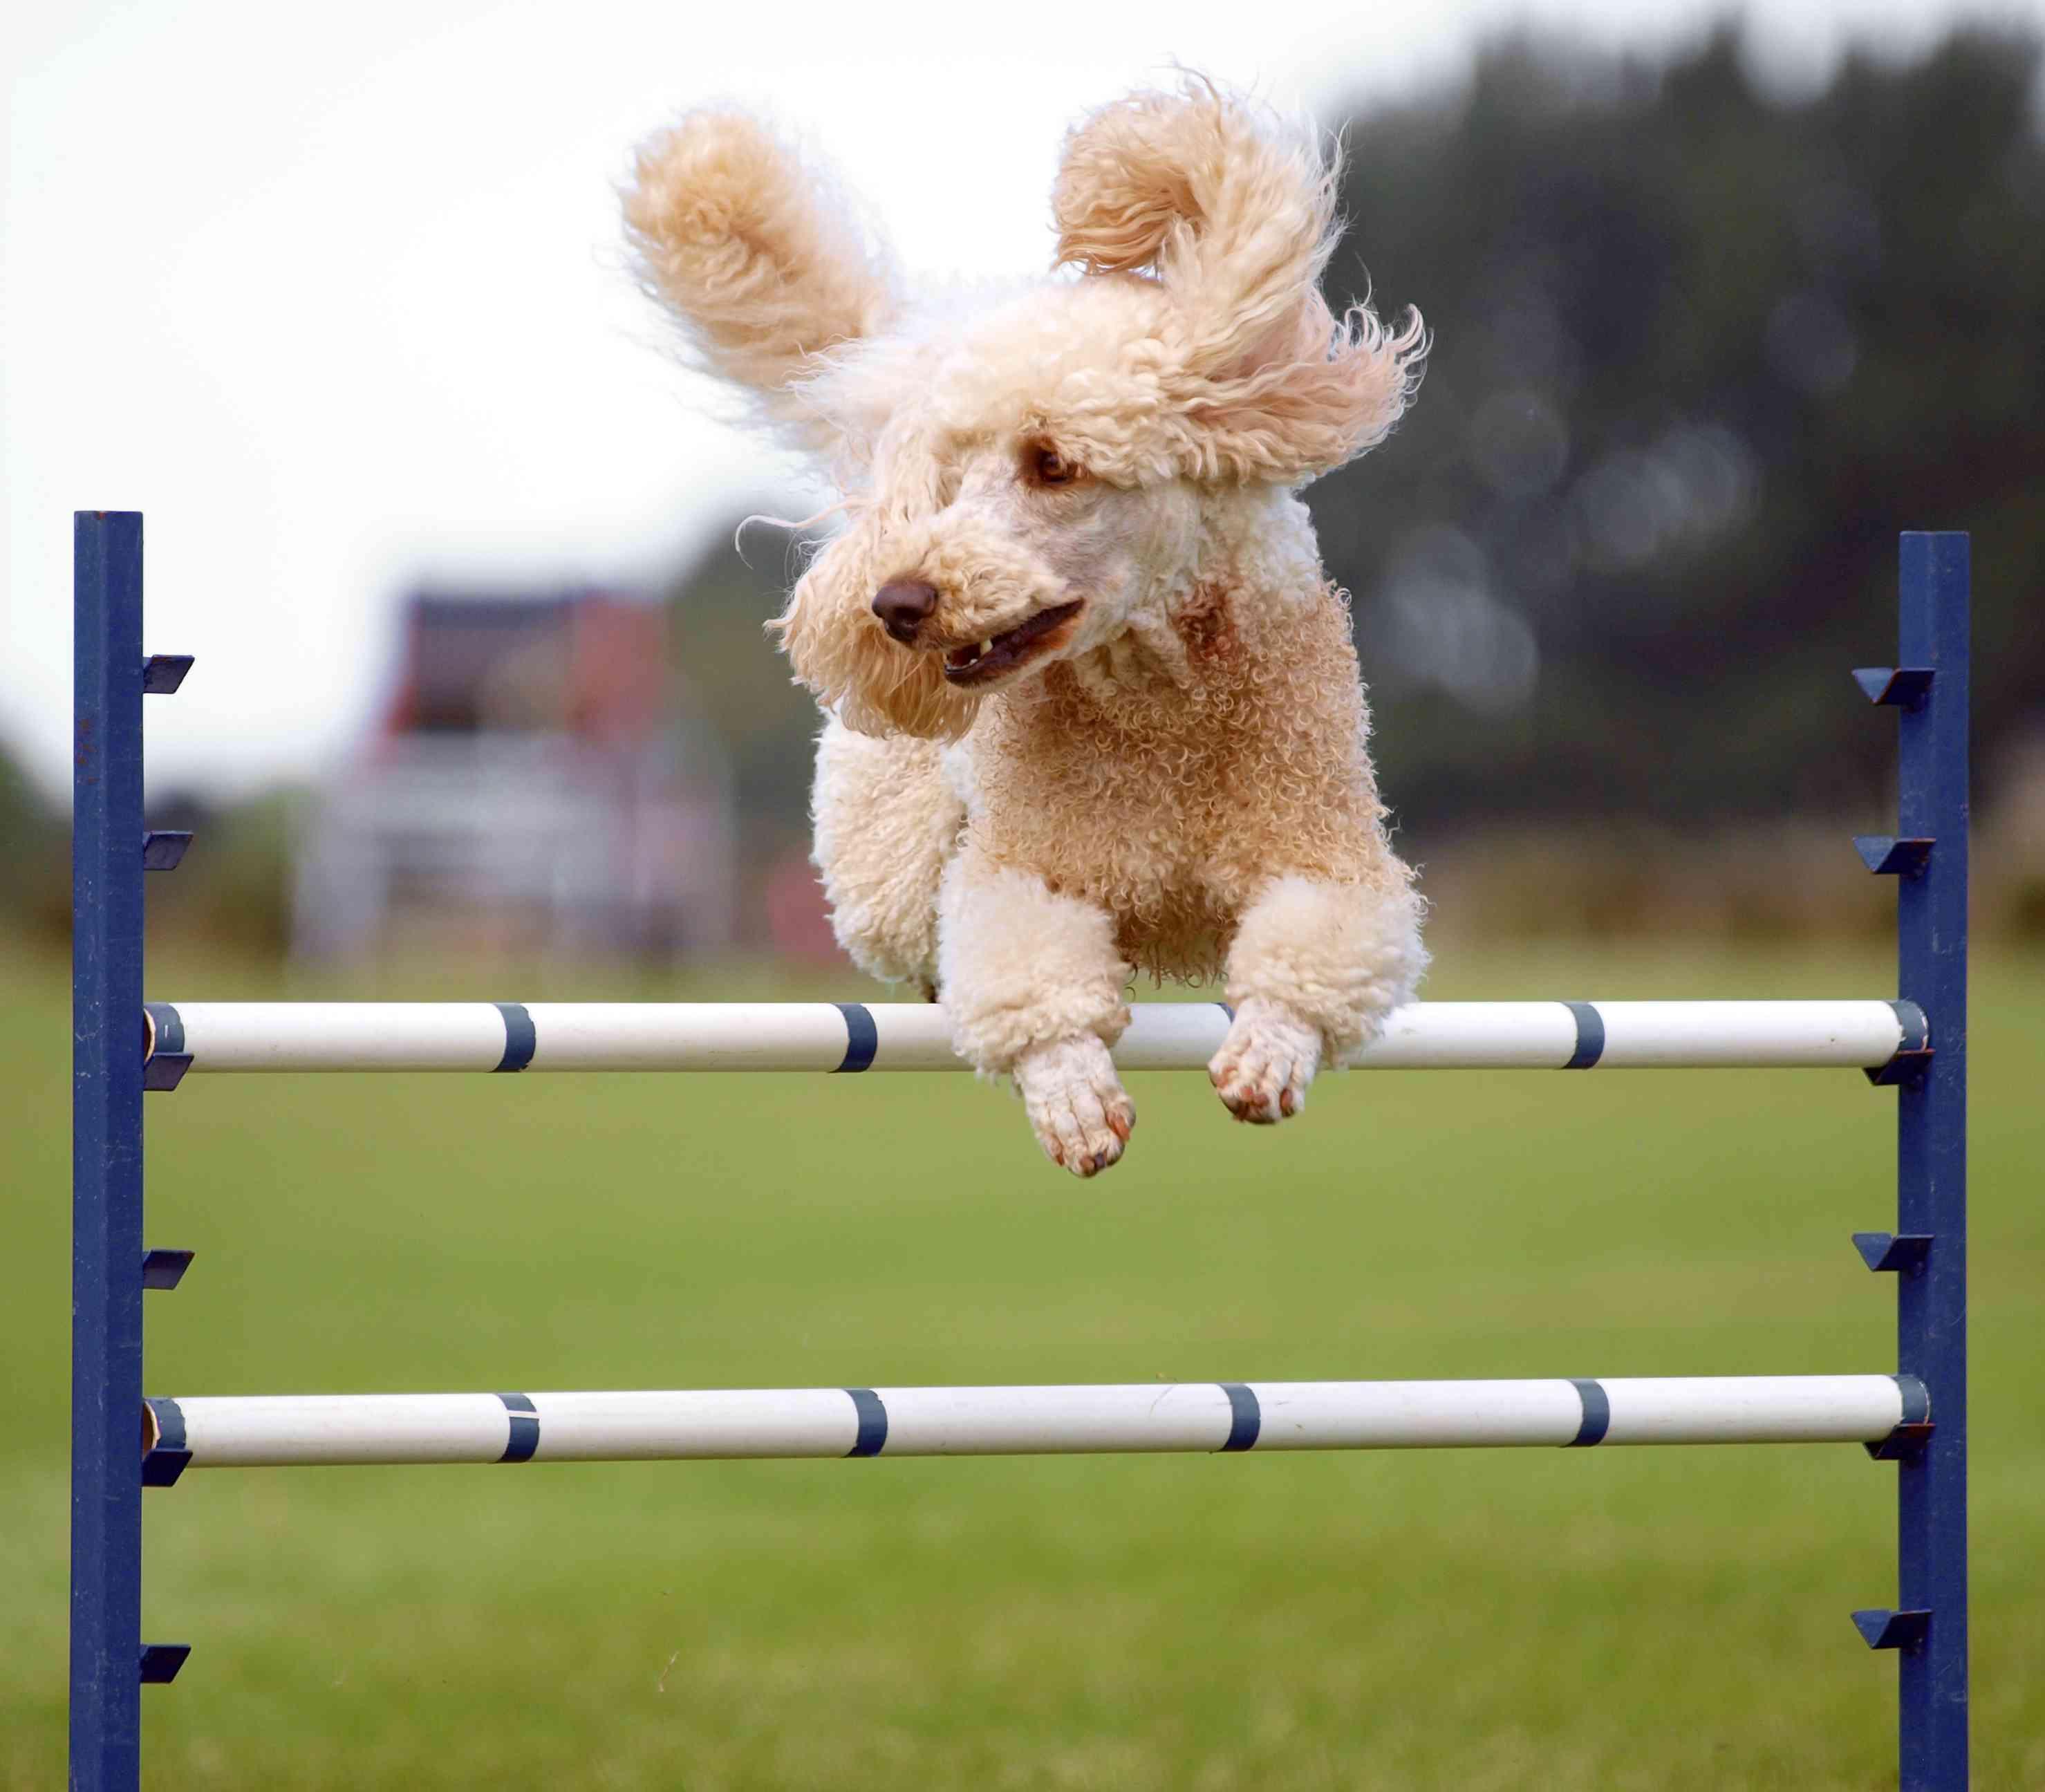 poodle doing agility jump